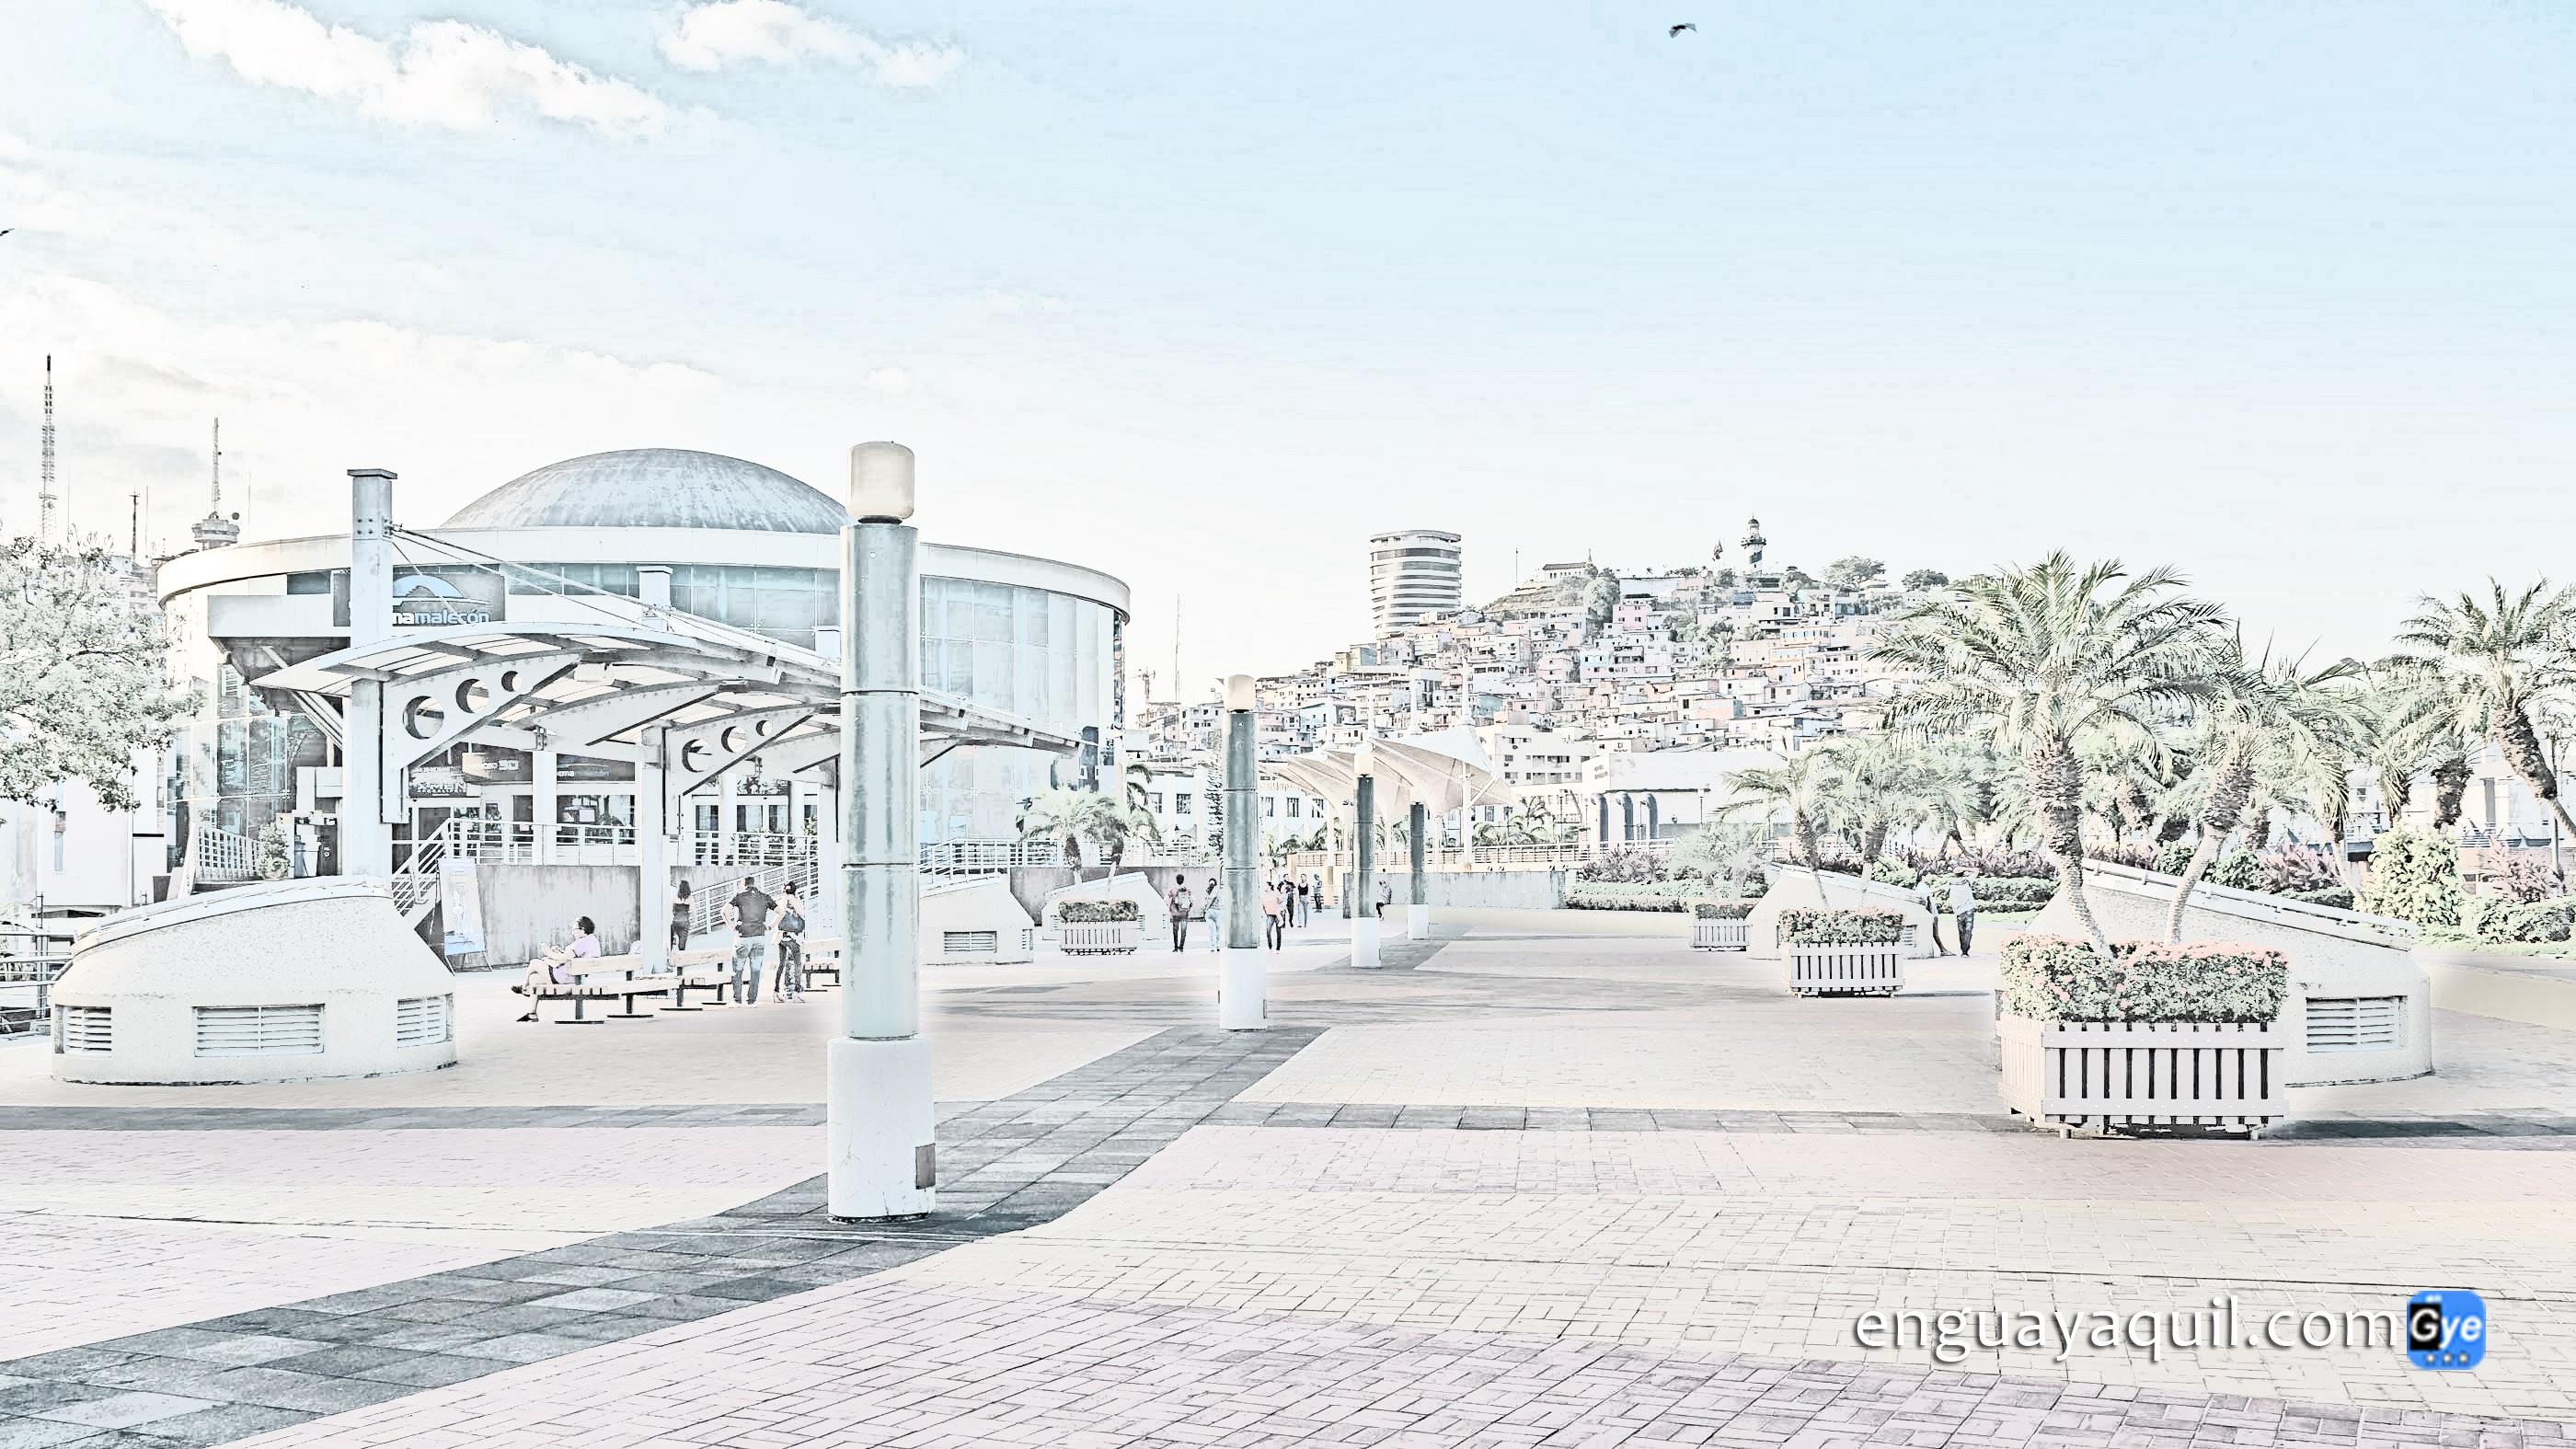 Dibujos de Guayaquil para colorear Malecon 2000